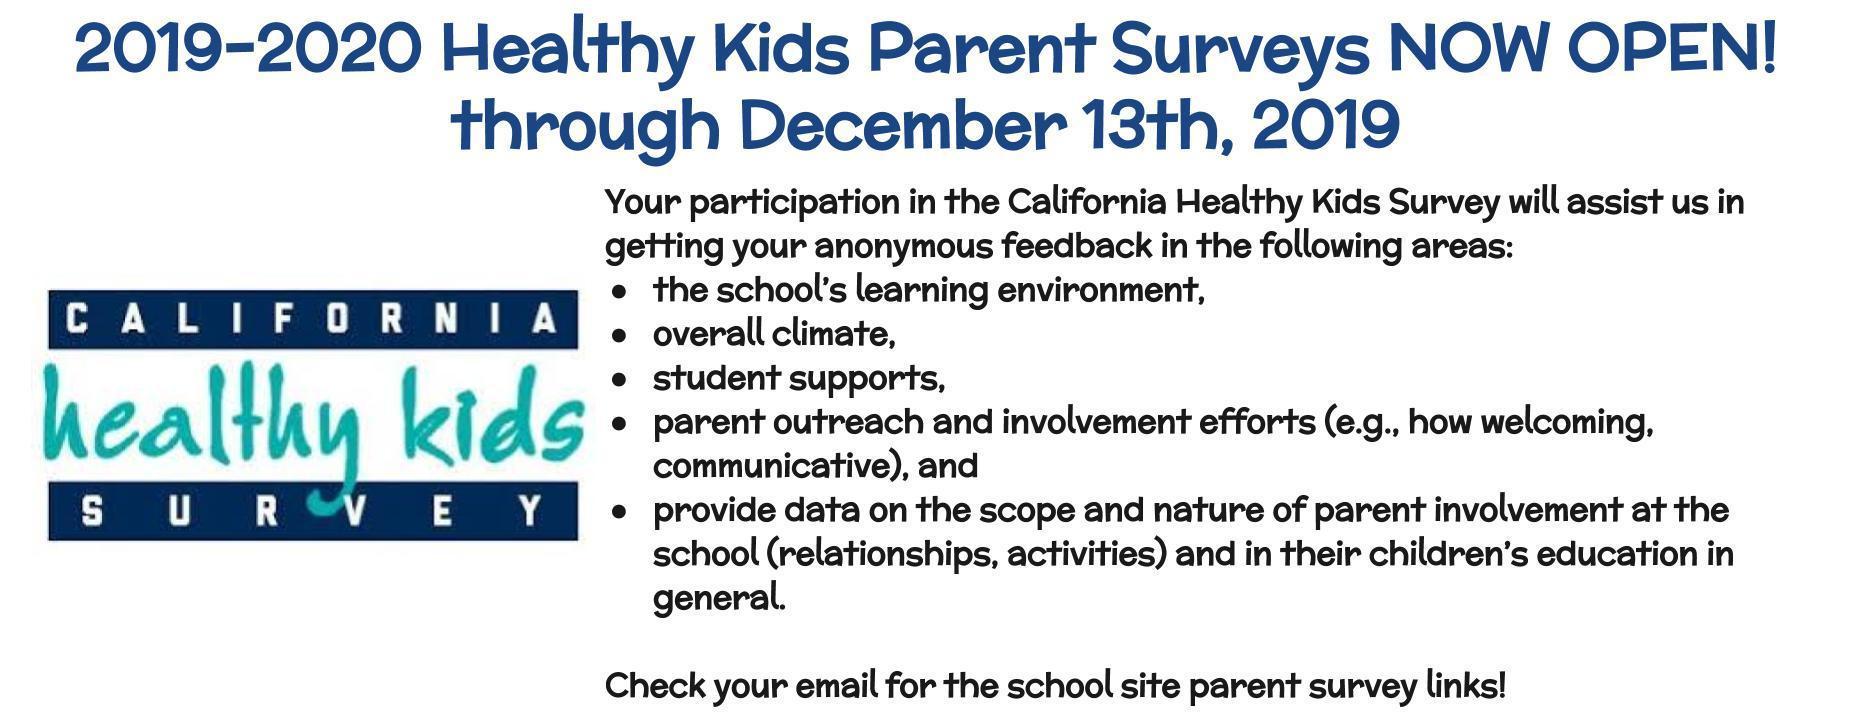 Healthy Kids Survey Information